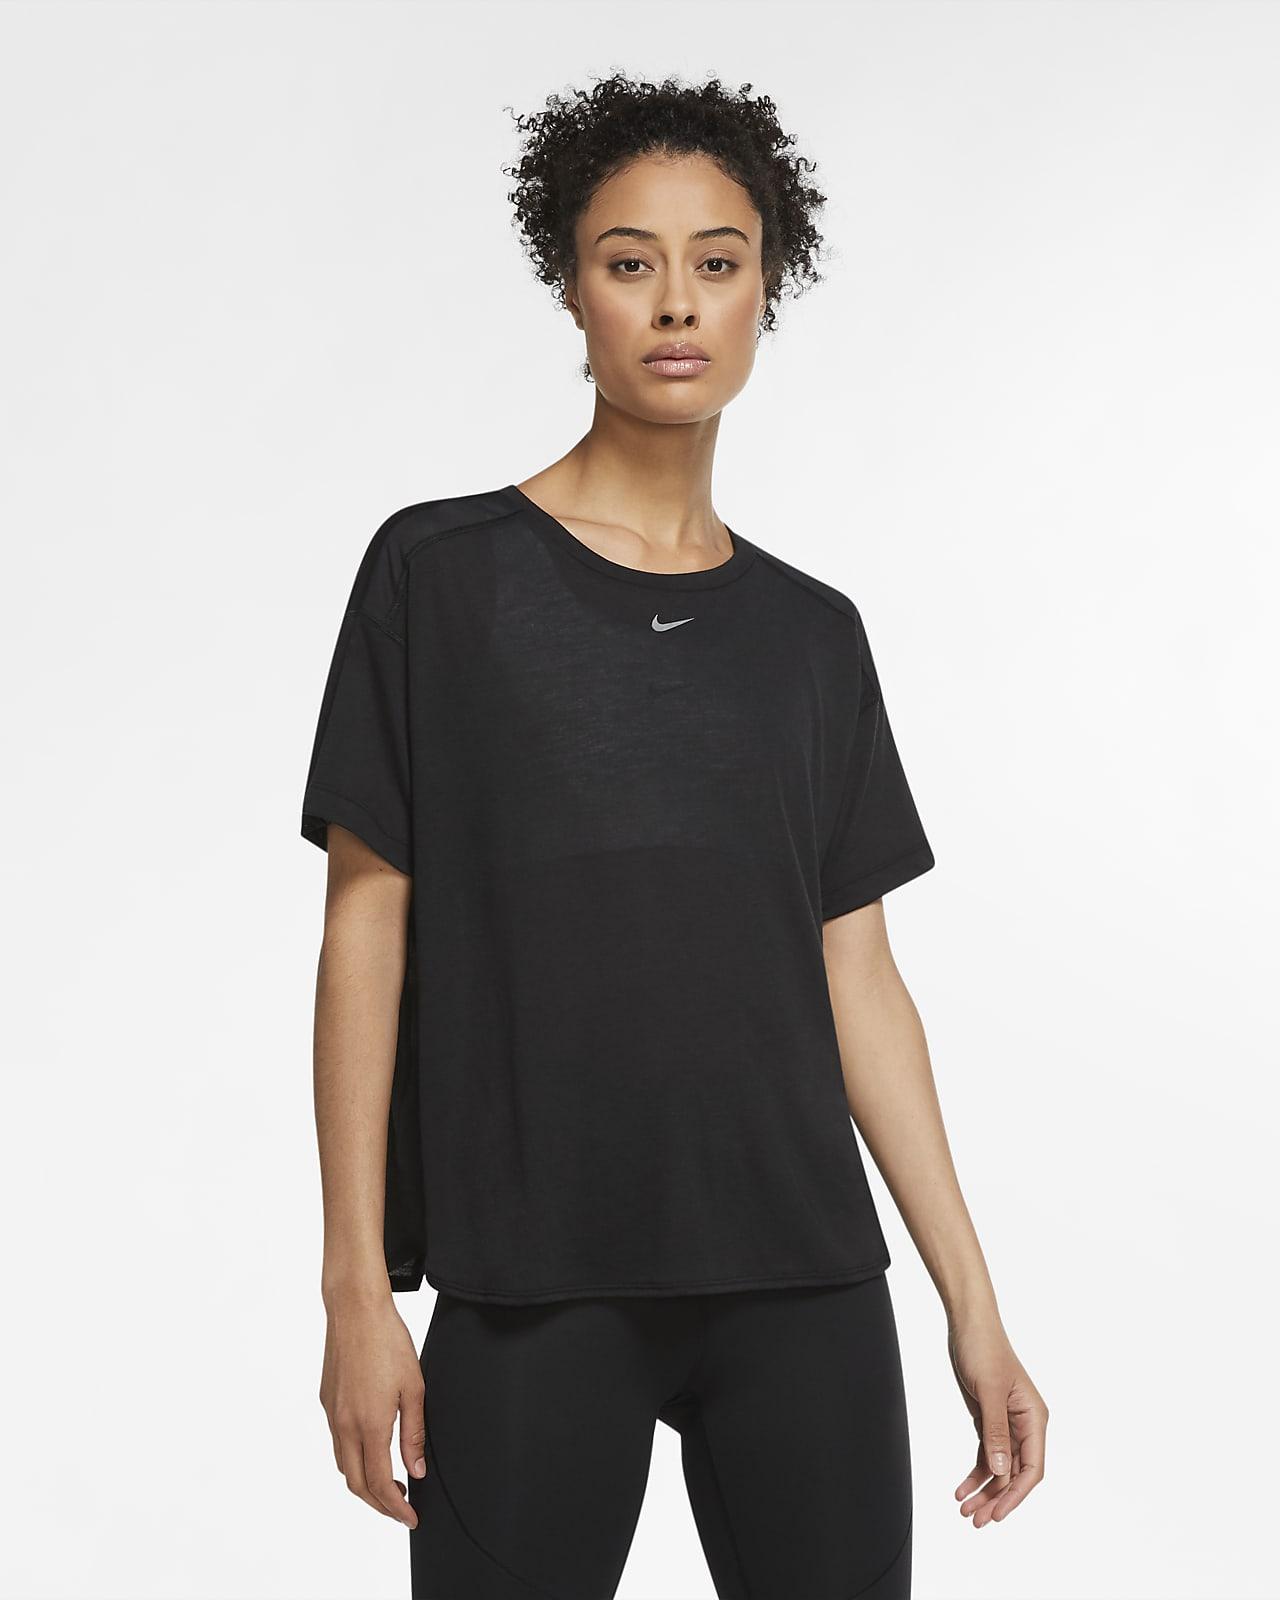 Nike Pro AeroAdapt Kurzarm-Oberteil für Damen